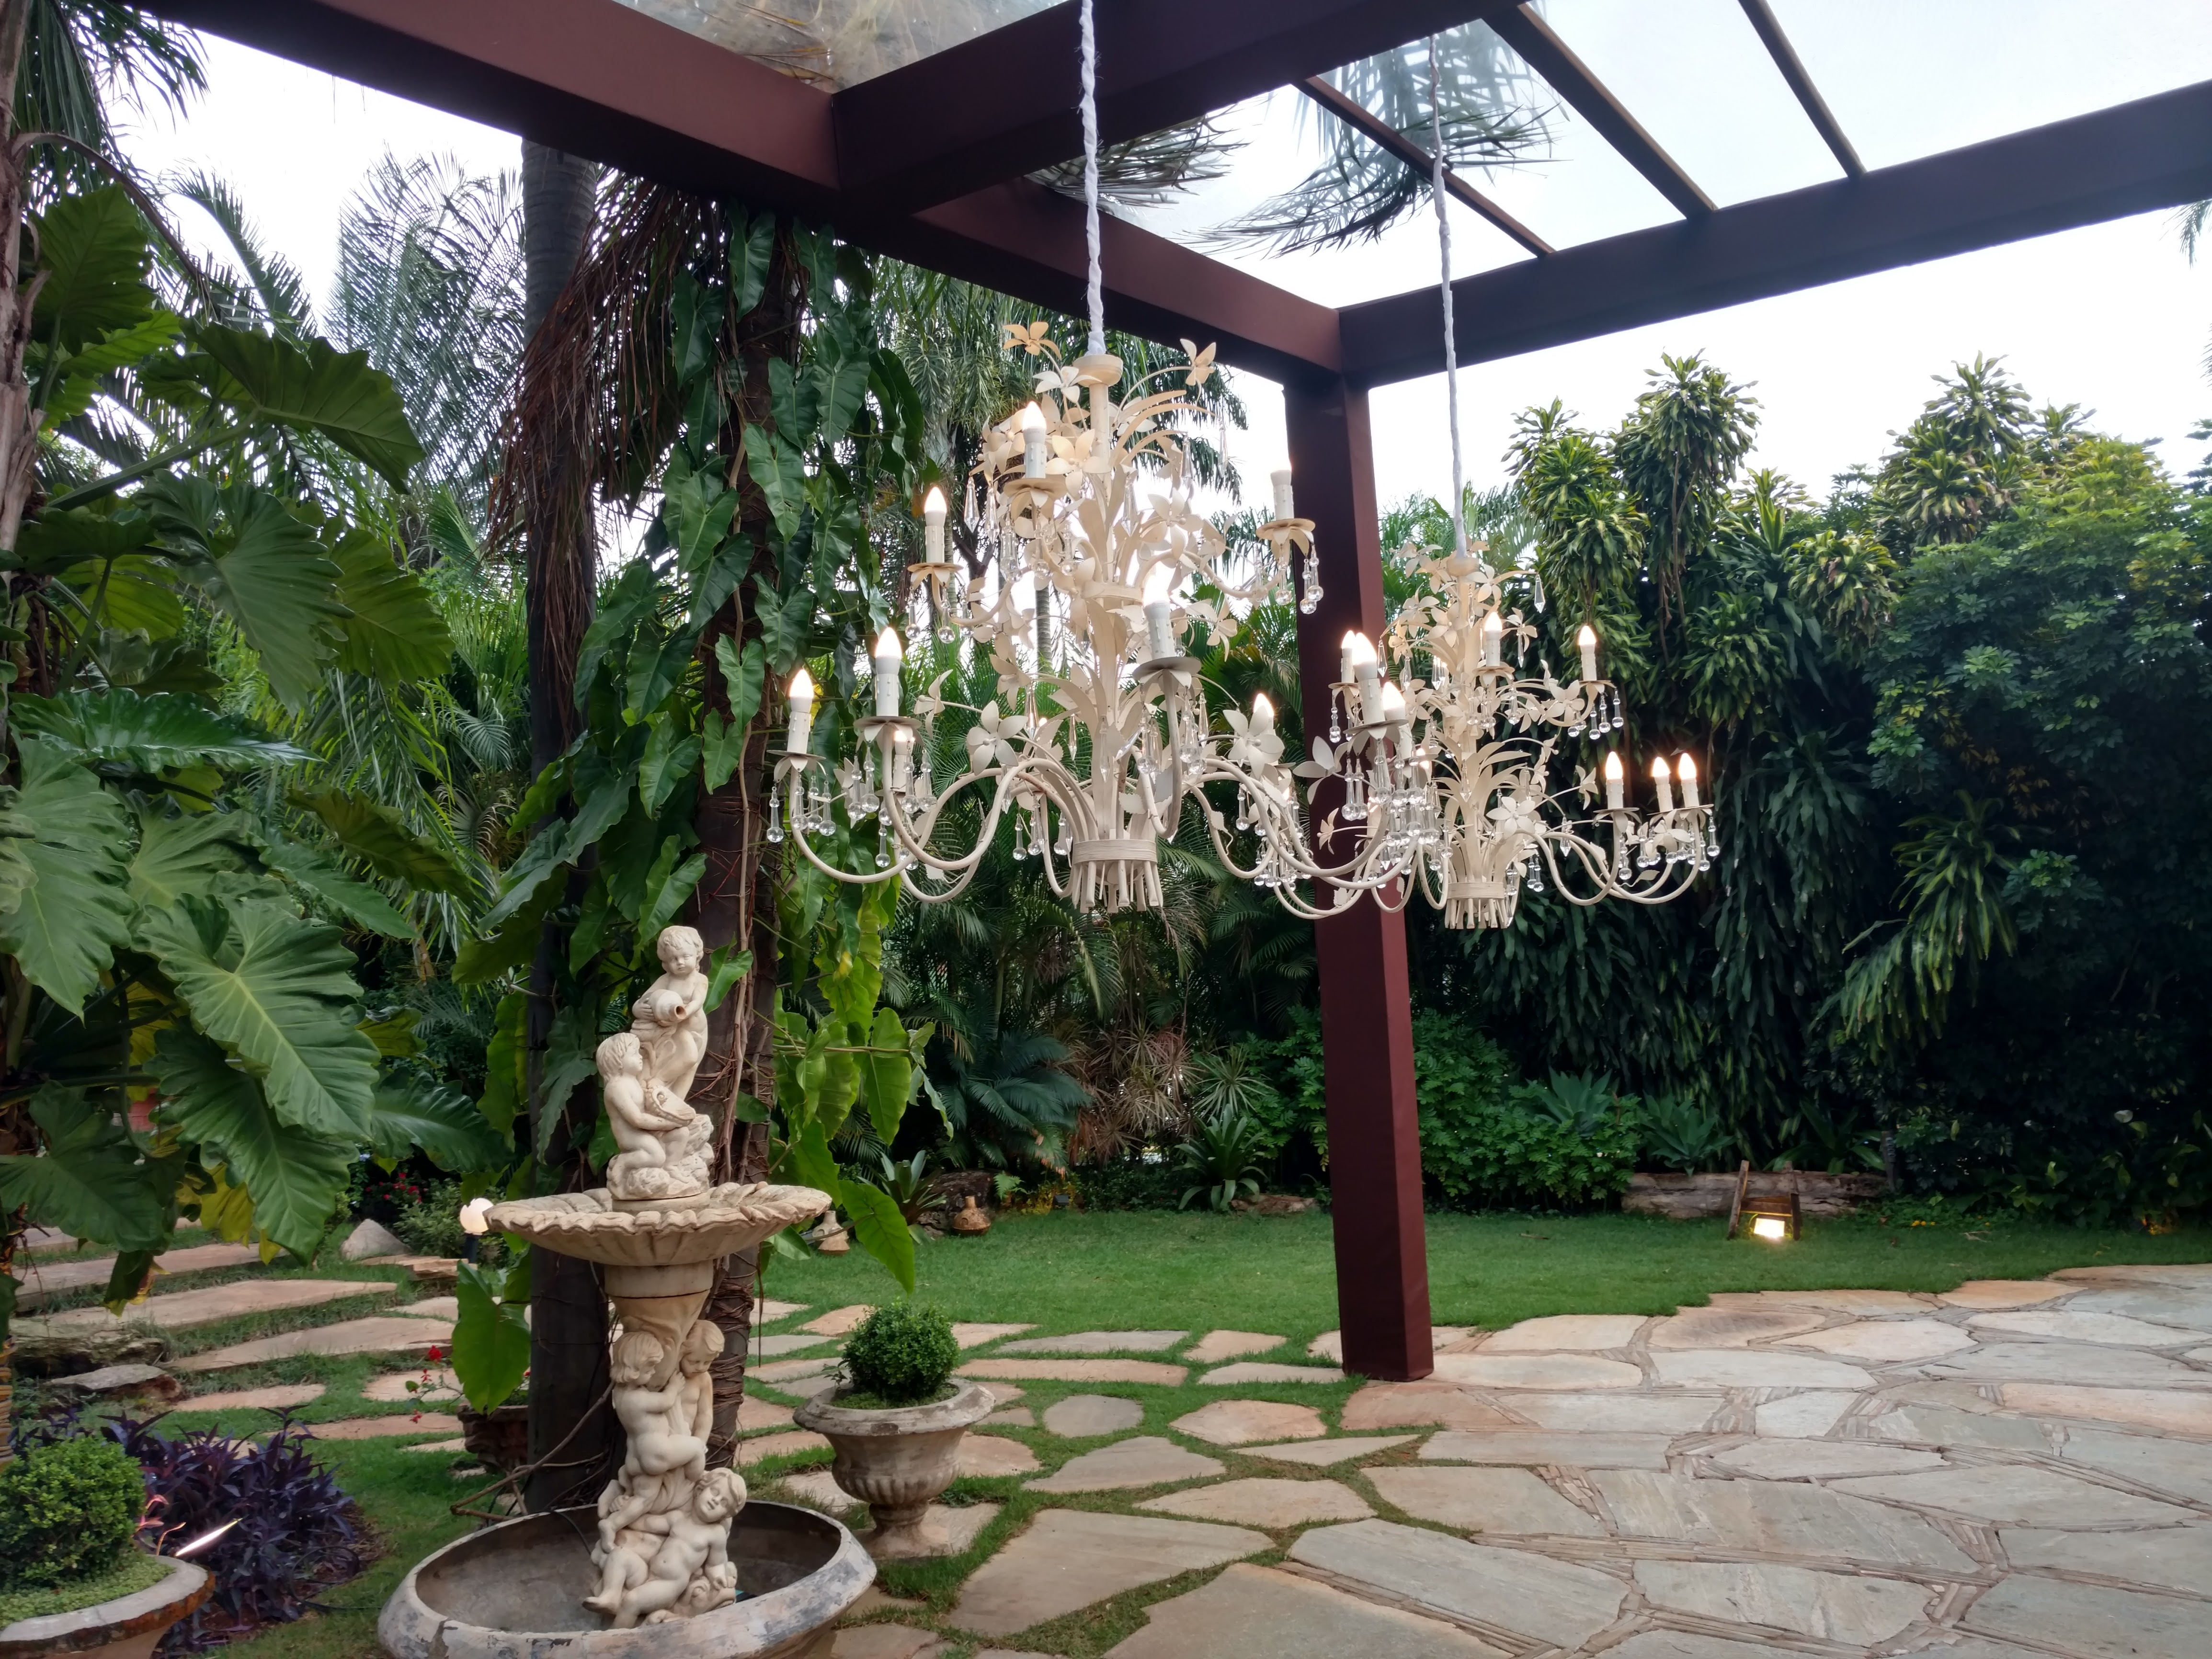 Projeto de Arquitetura, Bombeiro e Design de Interiores -Spazio Villa Regia (1)